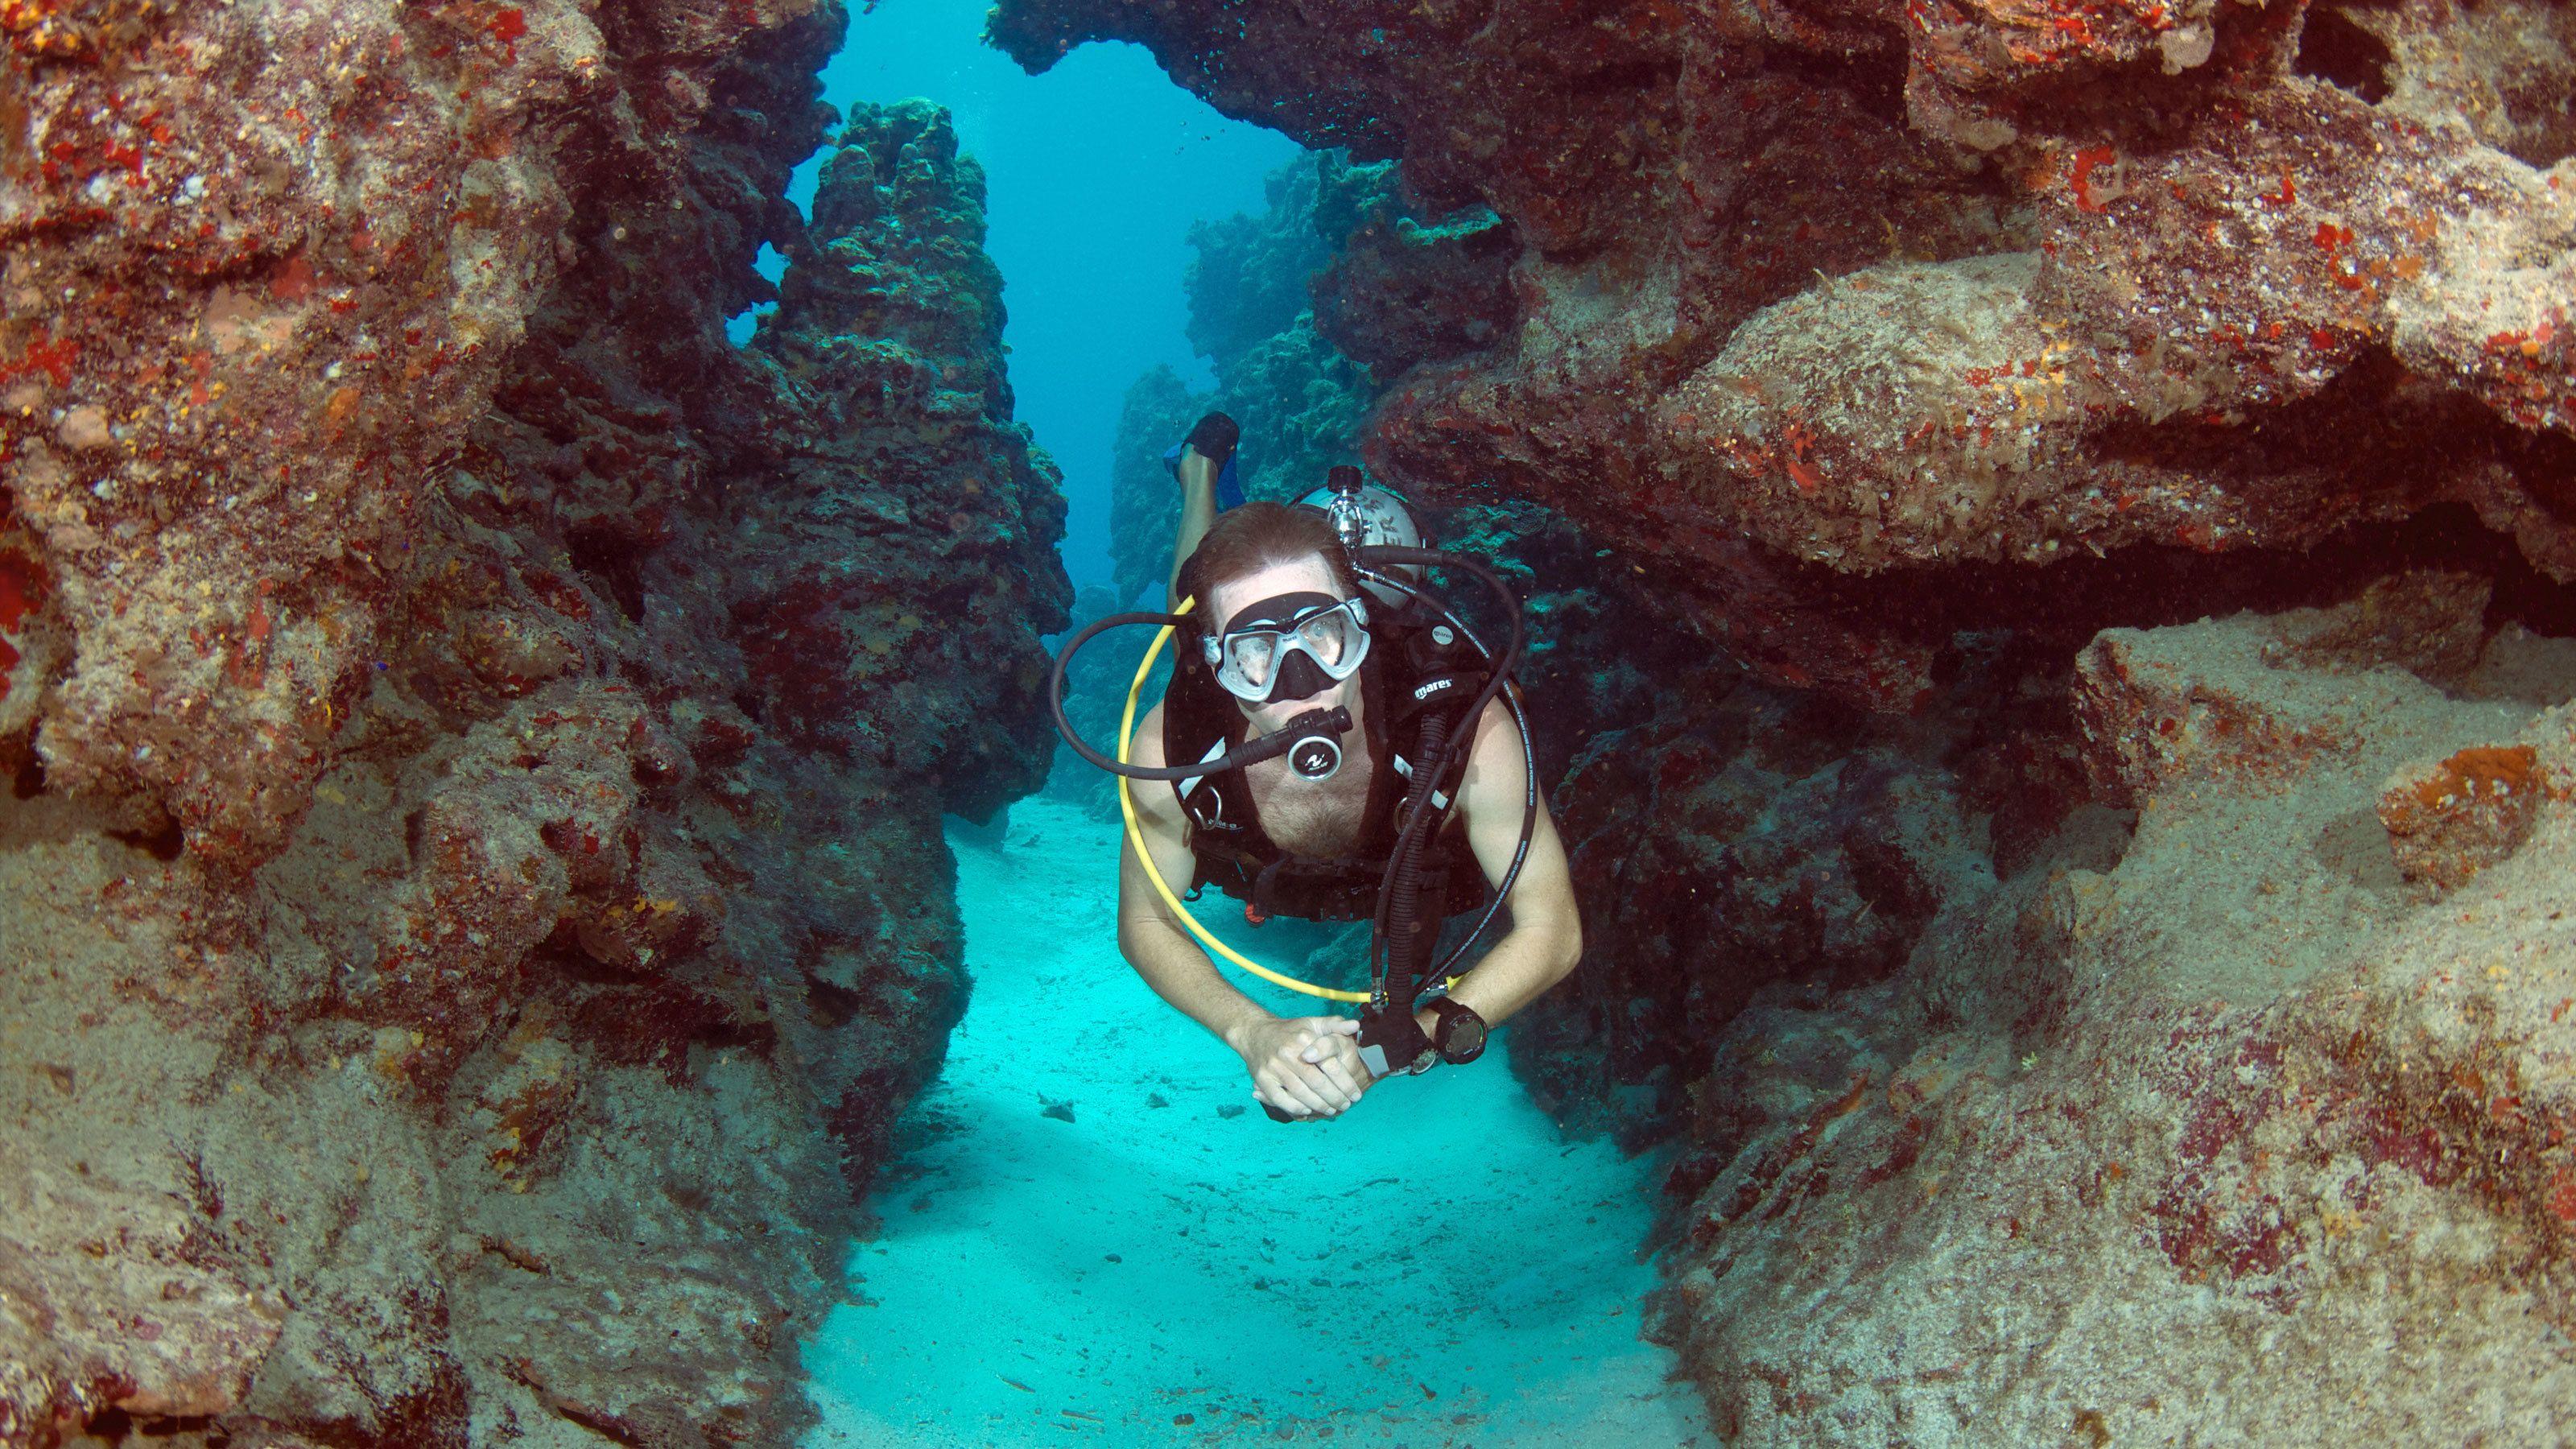 Scuba diver swimming through narrow rock walls in Grand Cayman